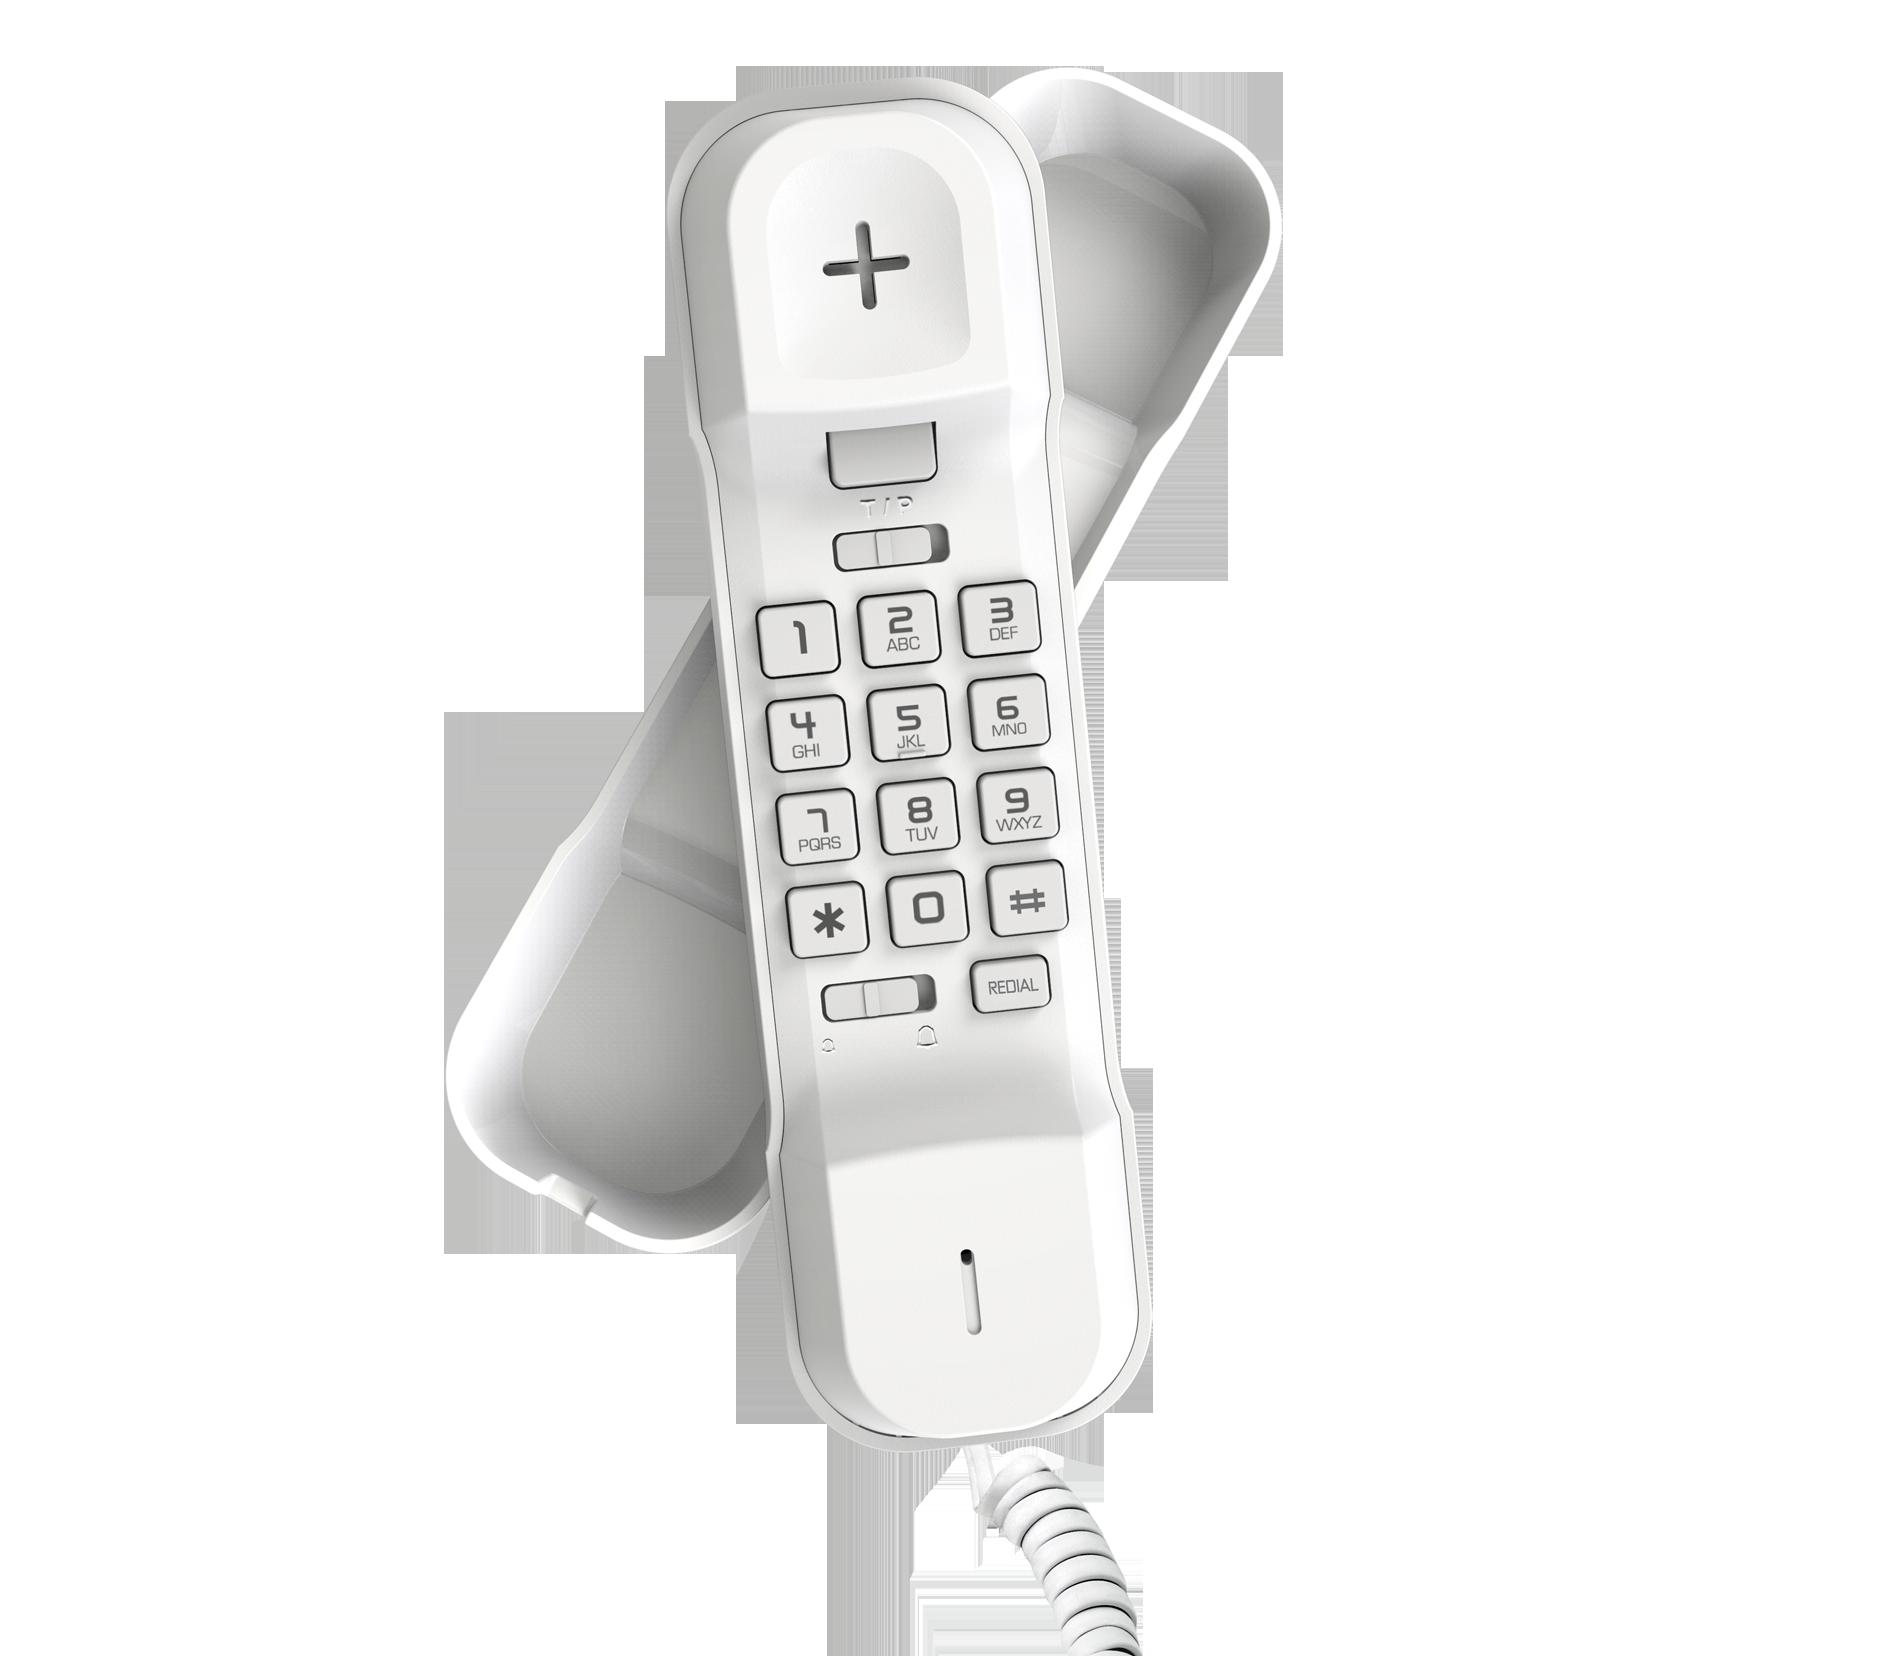 Alcatel T06 white